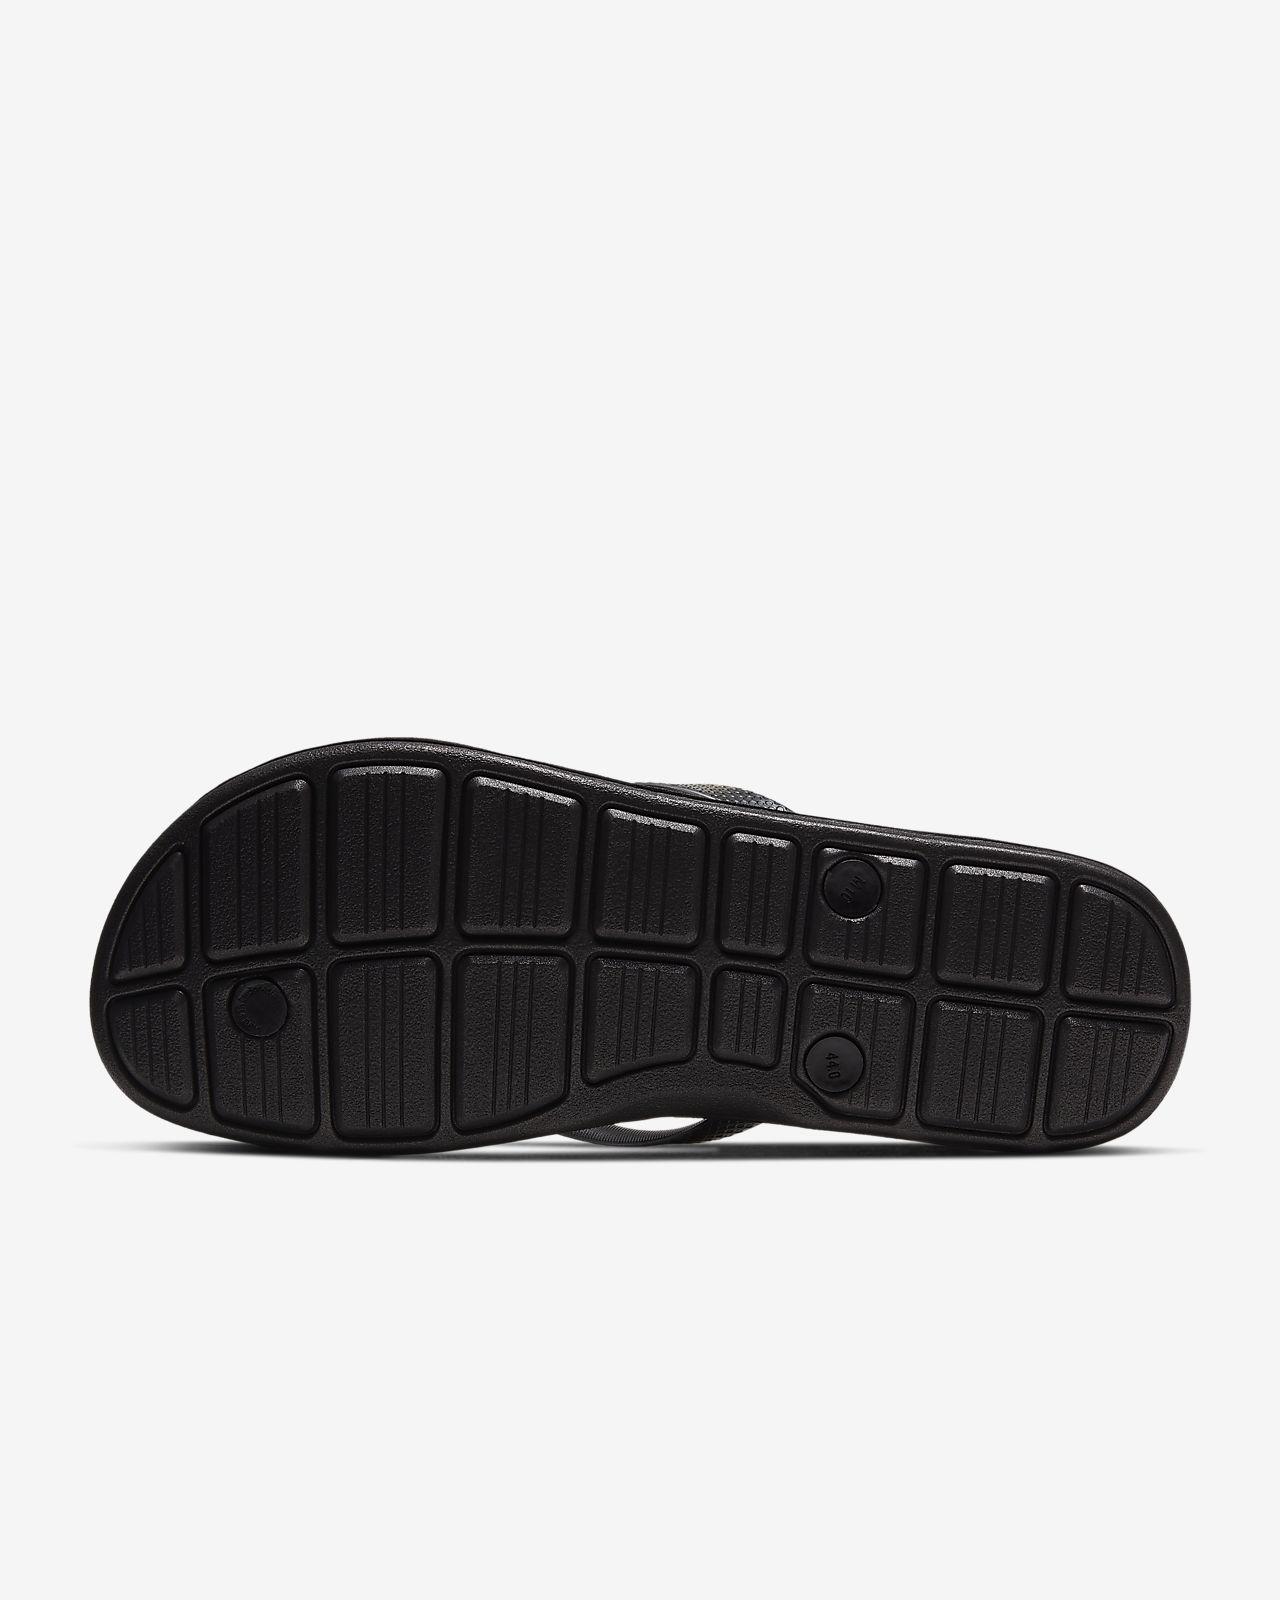 426d7c6efa08 Nike Solarsoft II Men s Flip Flop. Nike.com NL